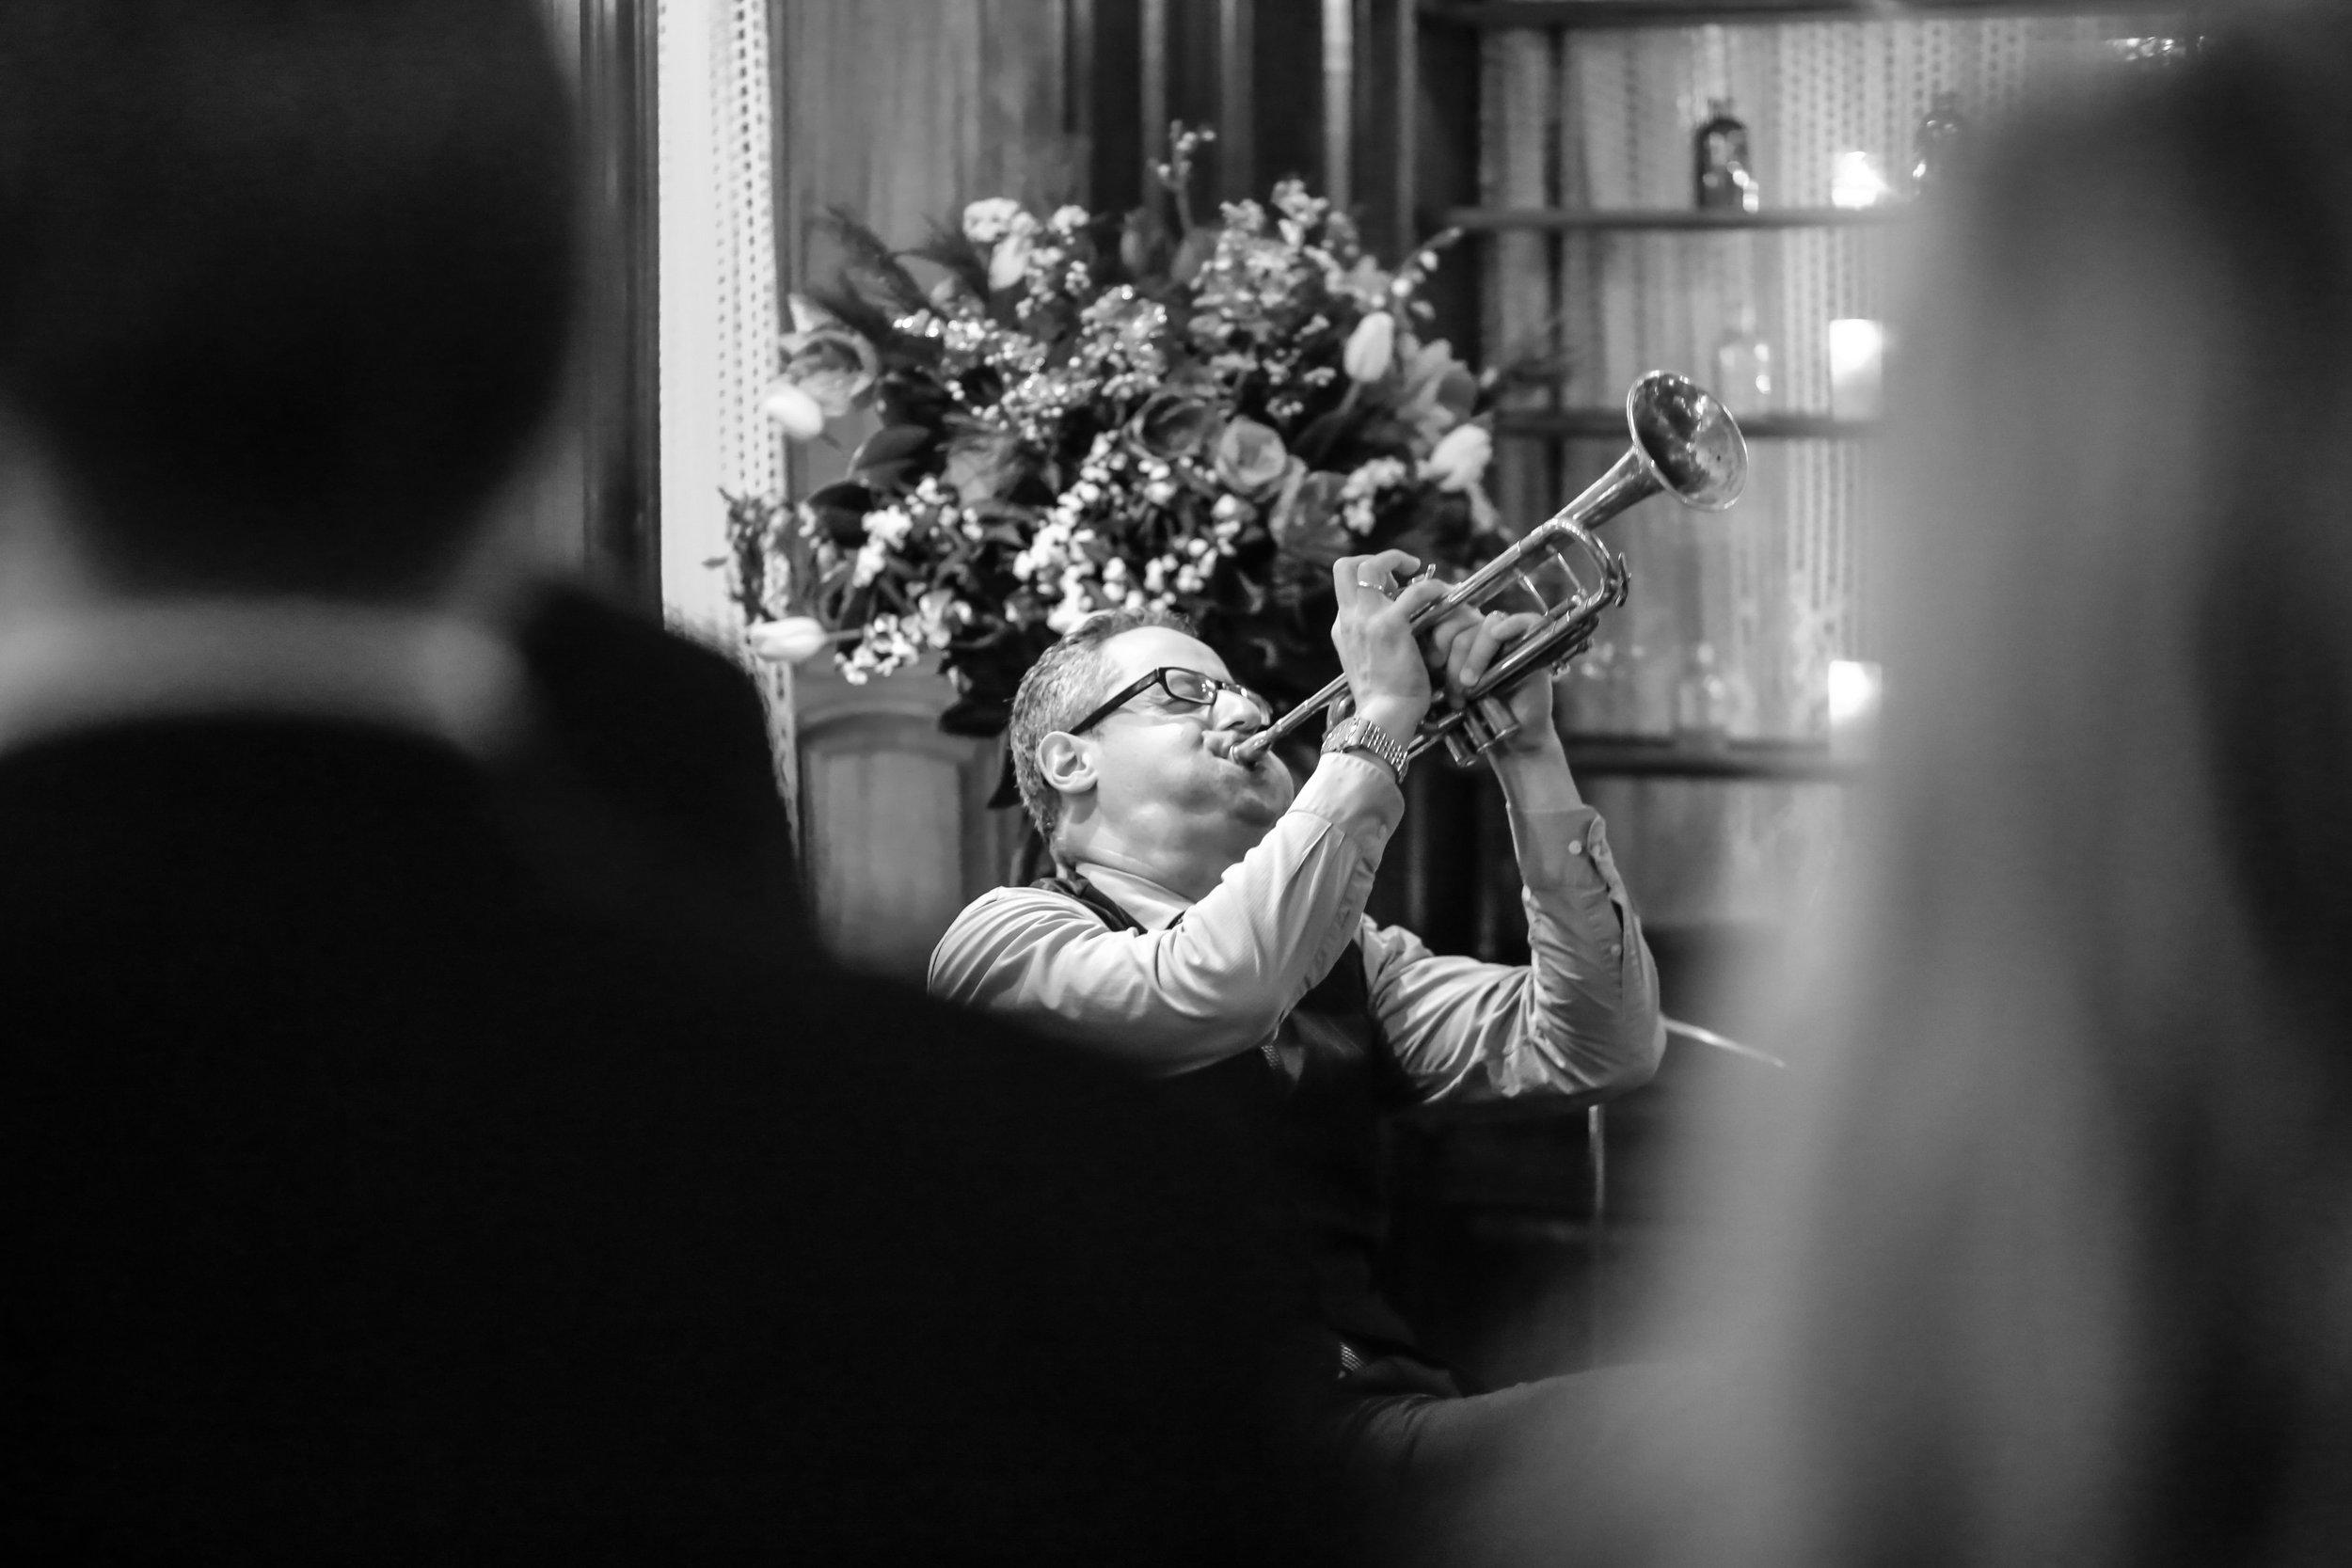 JJ-Ignotz-NYC-Photographer-parties_007.JPG